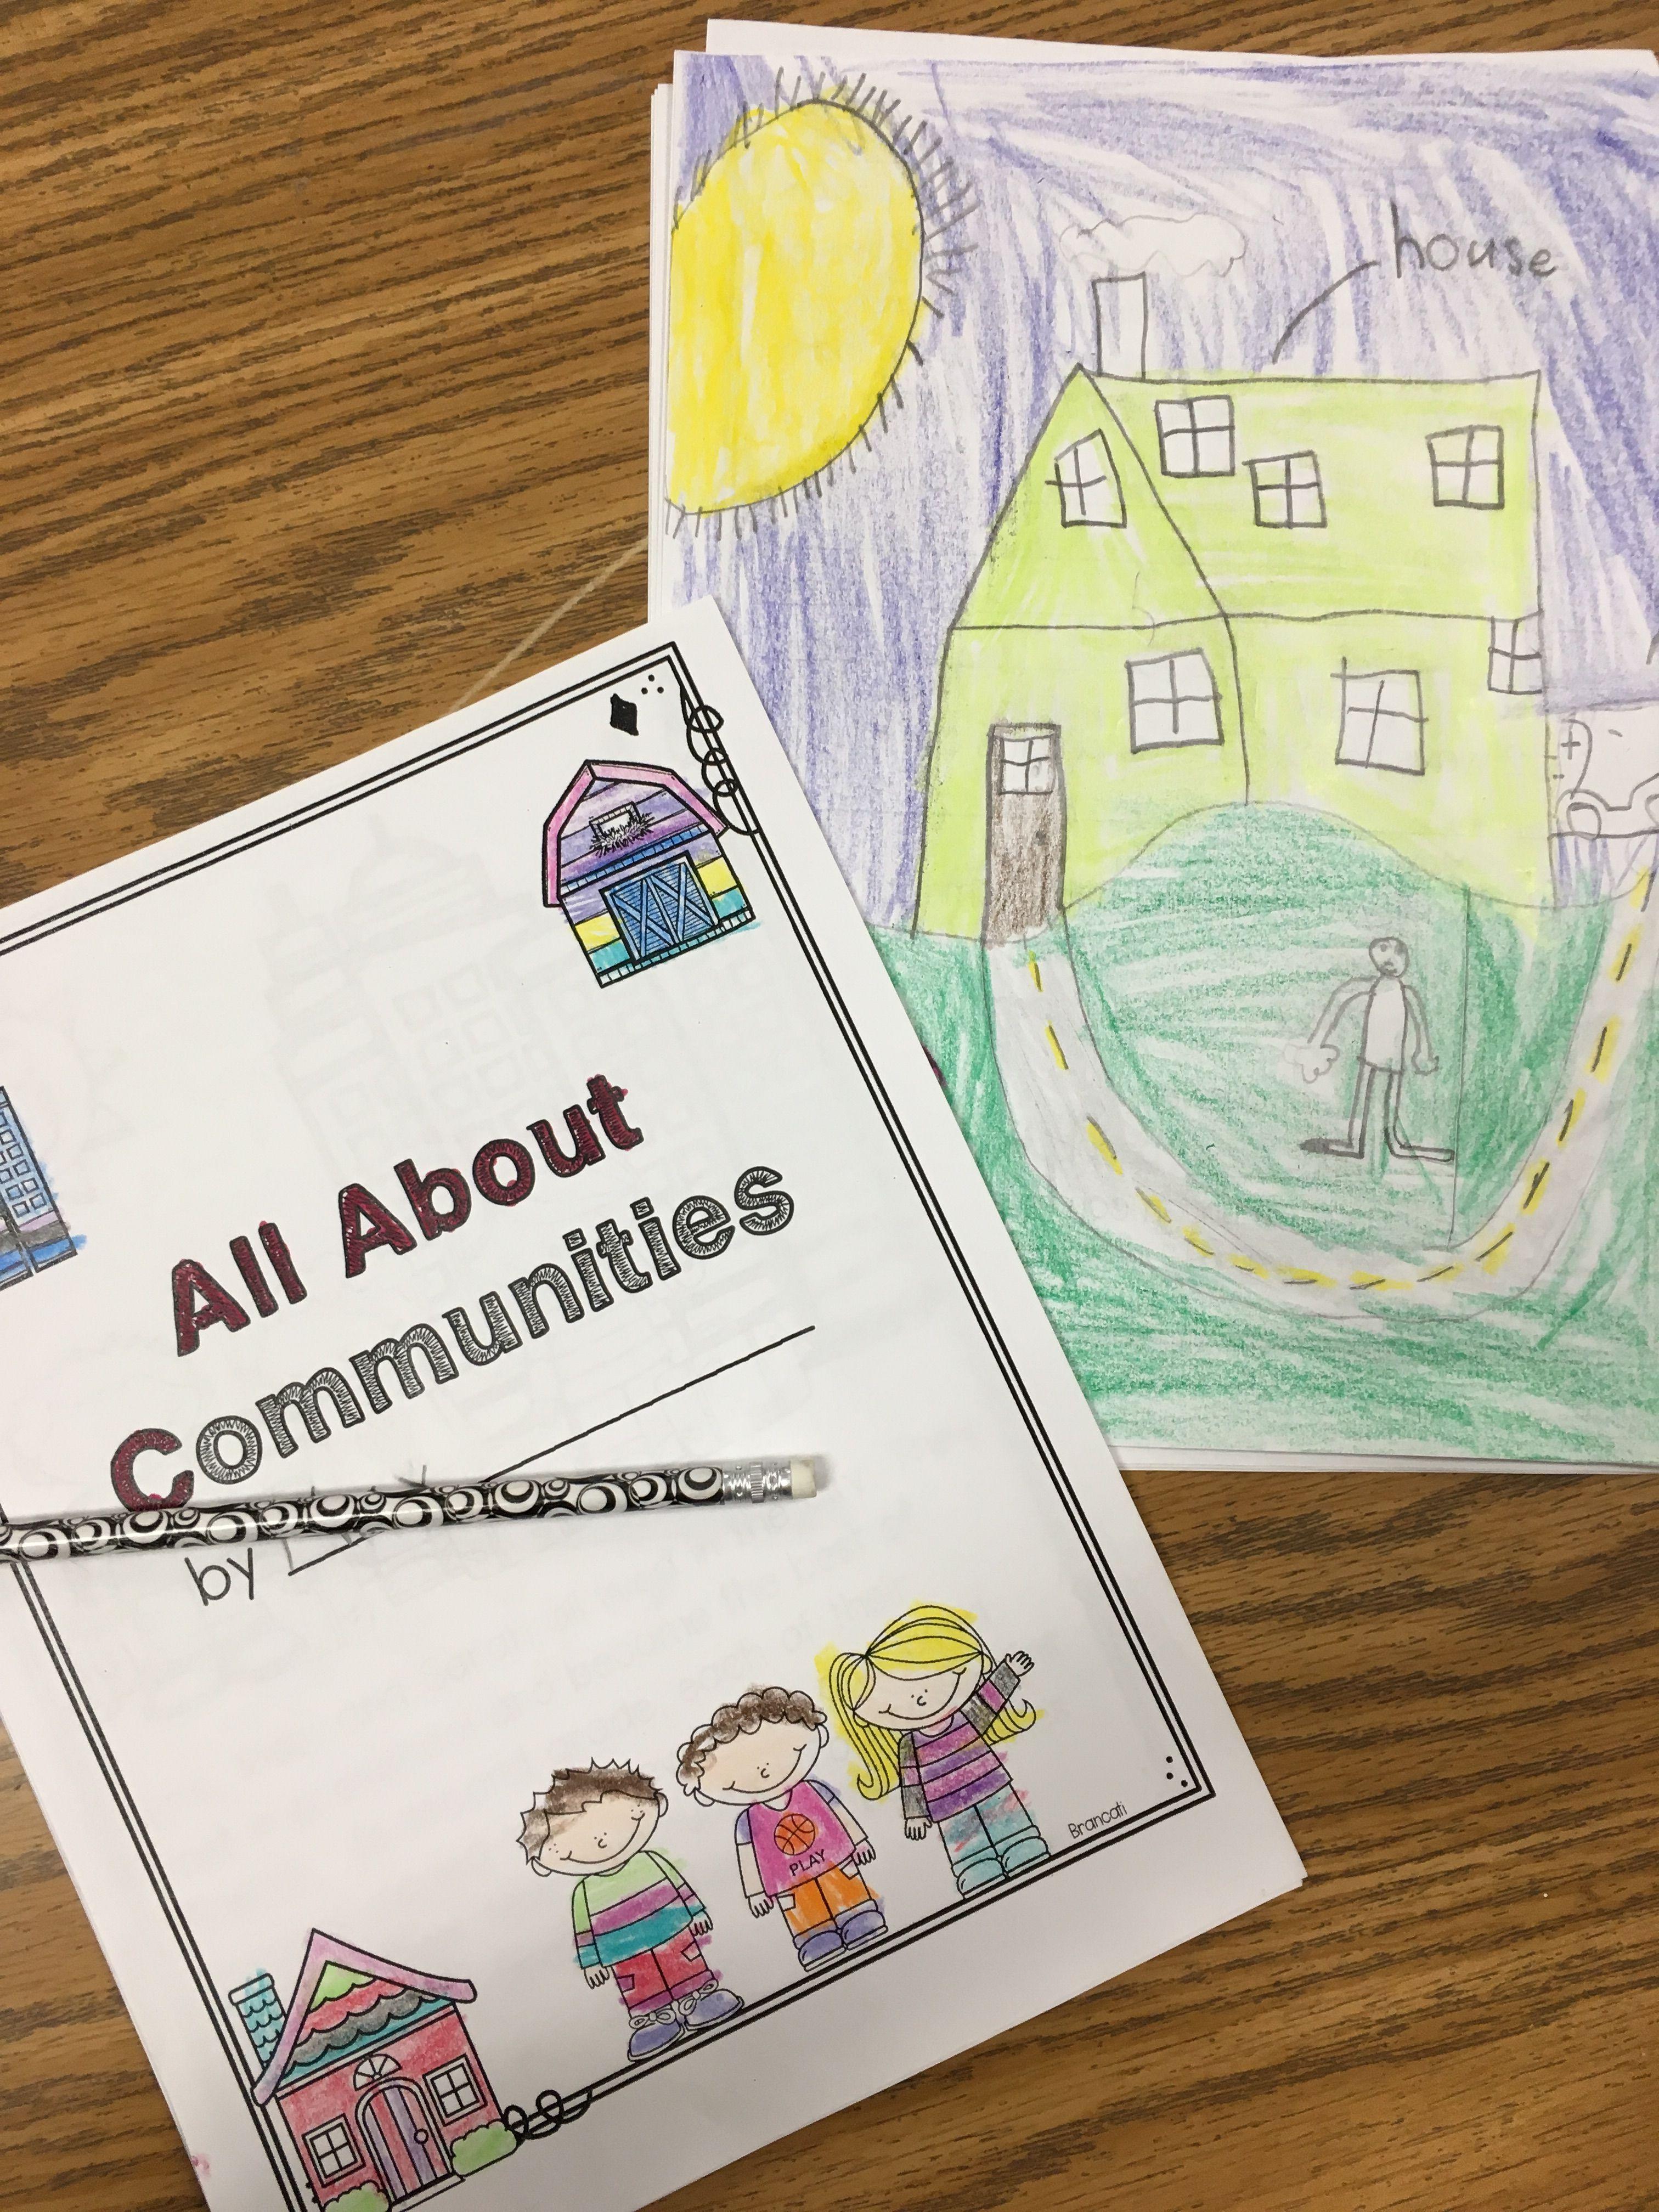 Communities Rural Suburban And Urban